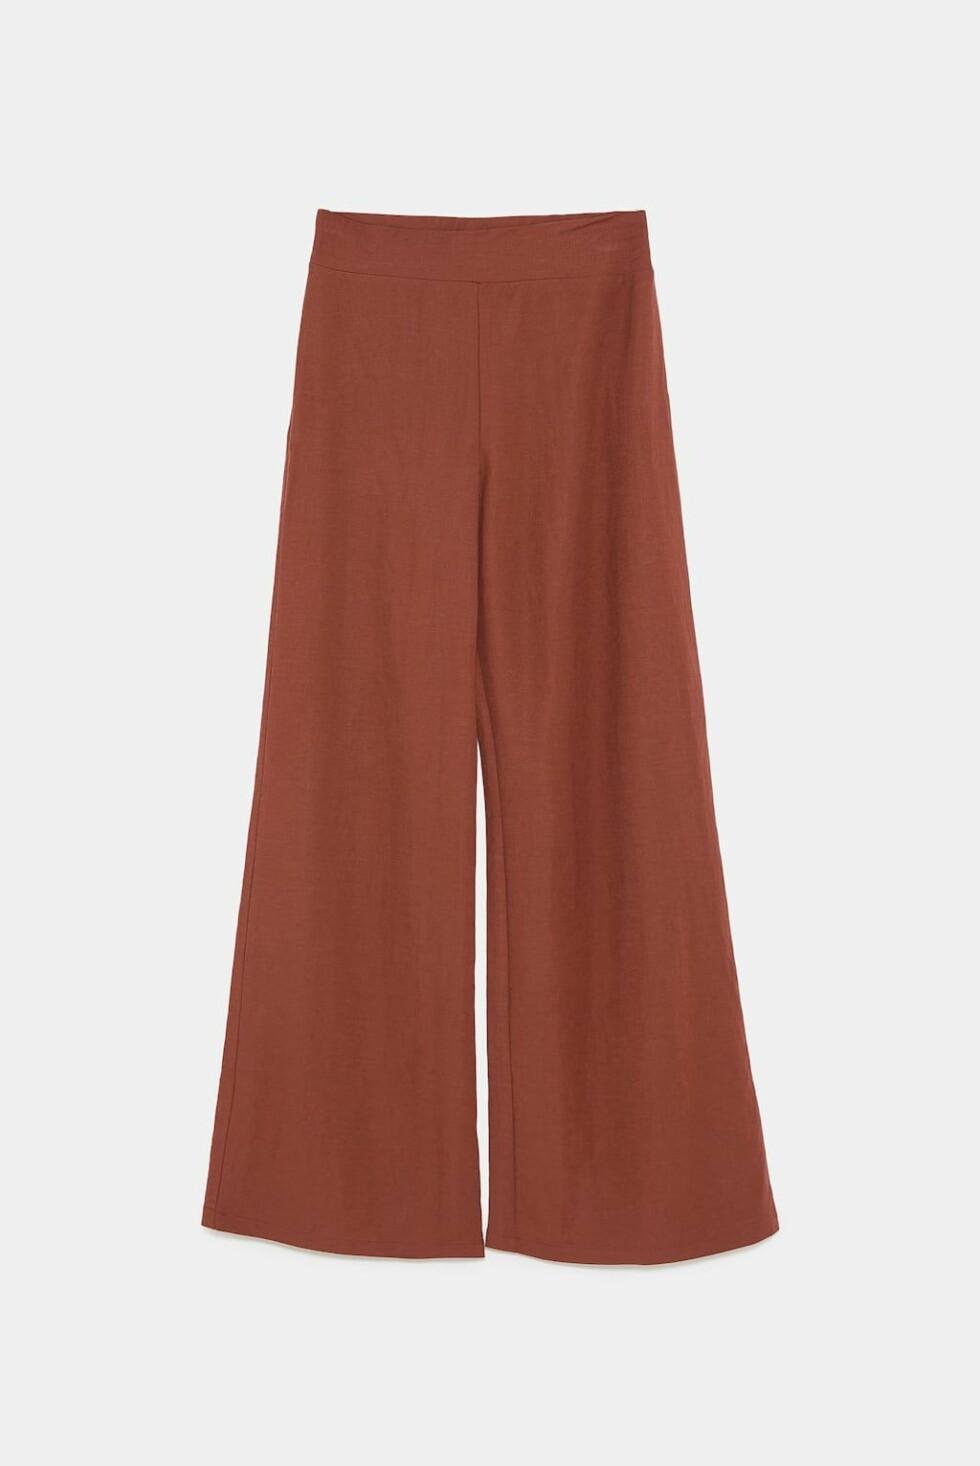 <strong>Culotter fra Zara  230,-  https:</strong>//www.zara.com/no/no/culottebukse-p05580303.html?v1=6621589&v2=1074755